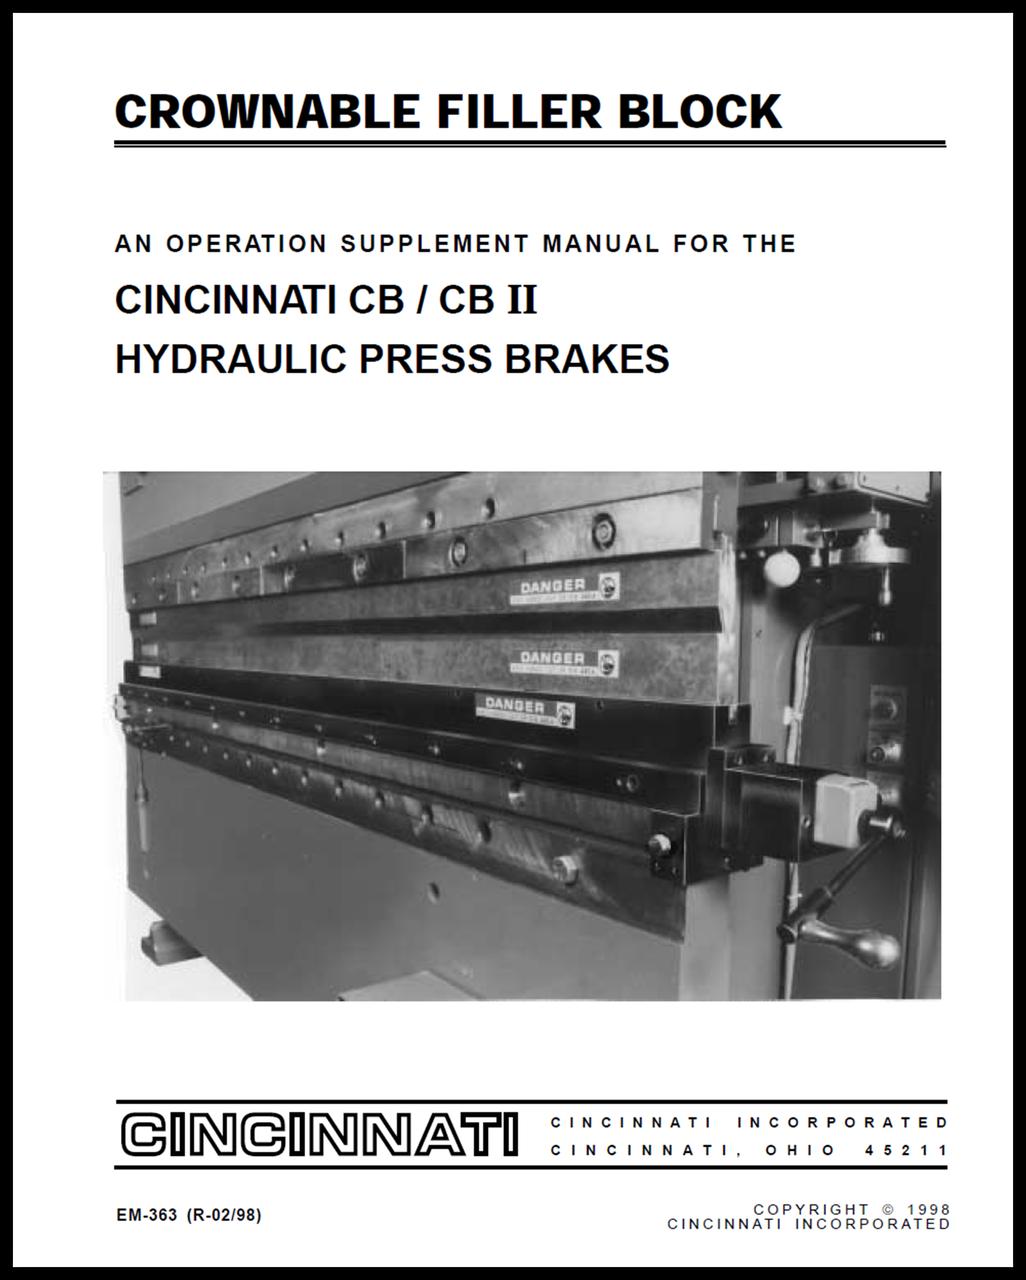 cb ii cnc press brake manual bundle cincinnati incorporated rh ci online e ci com Cincinnati Press Brake Chart Hydraulic Press Brake Circuit